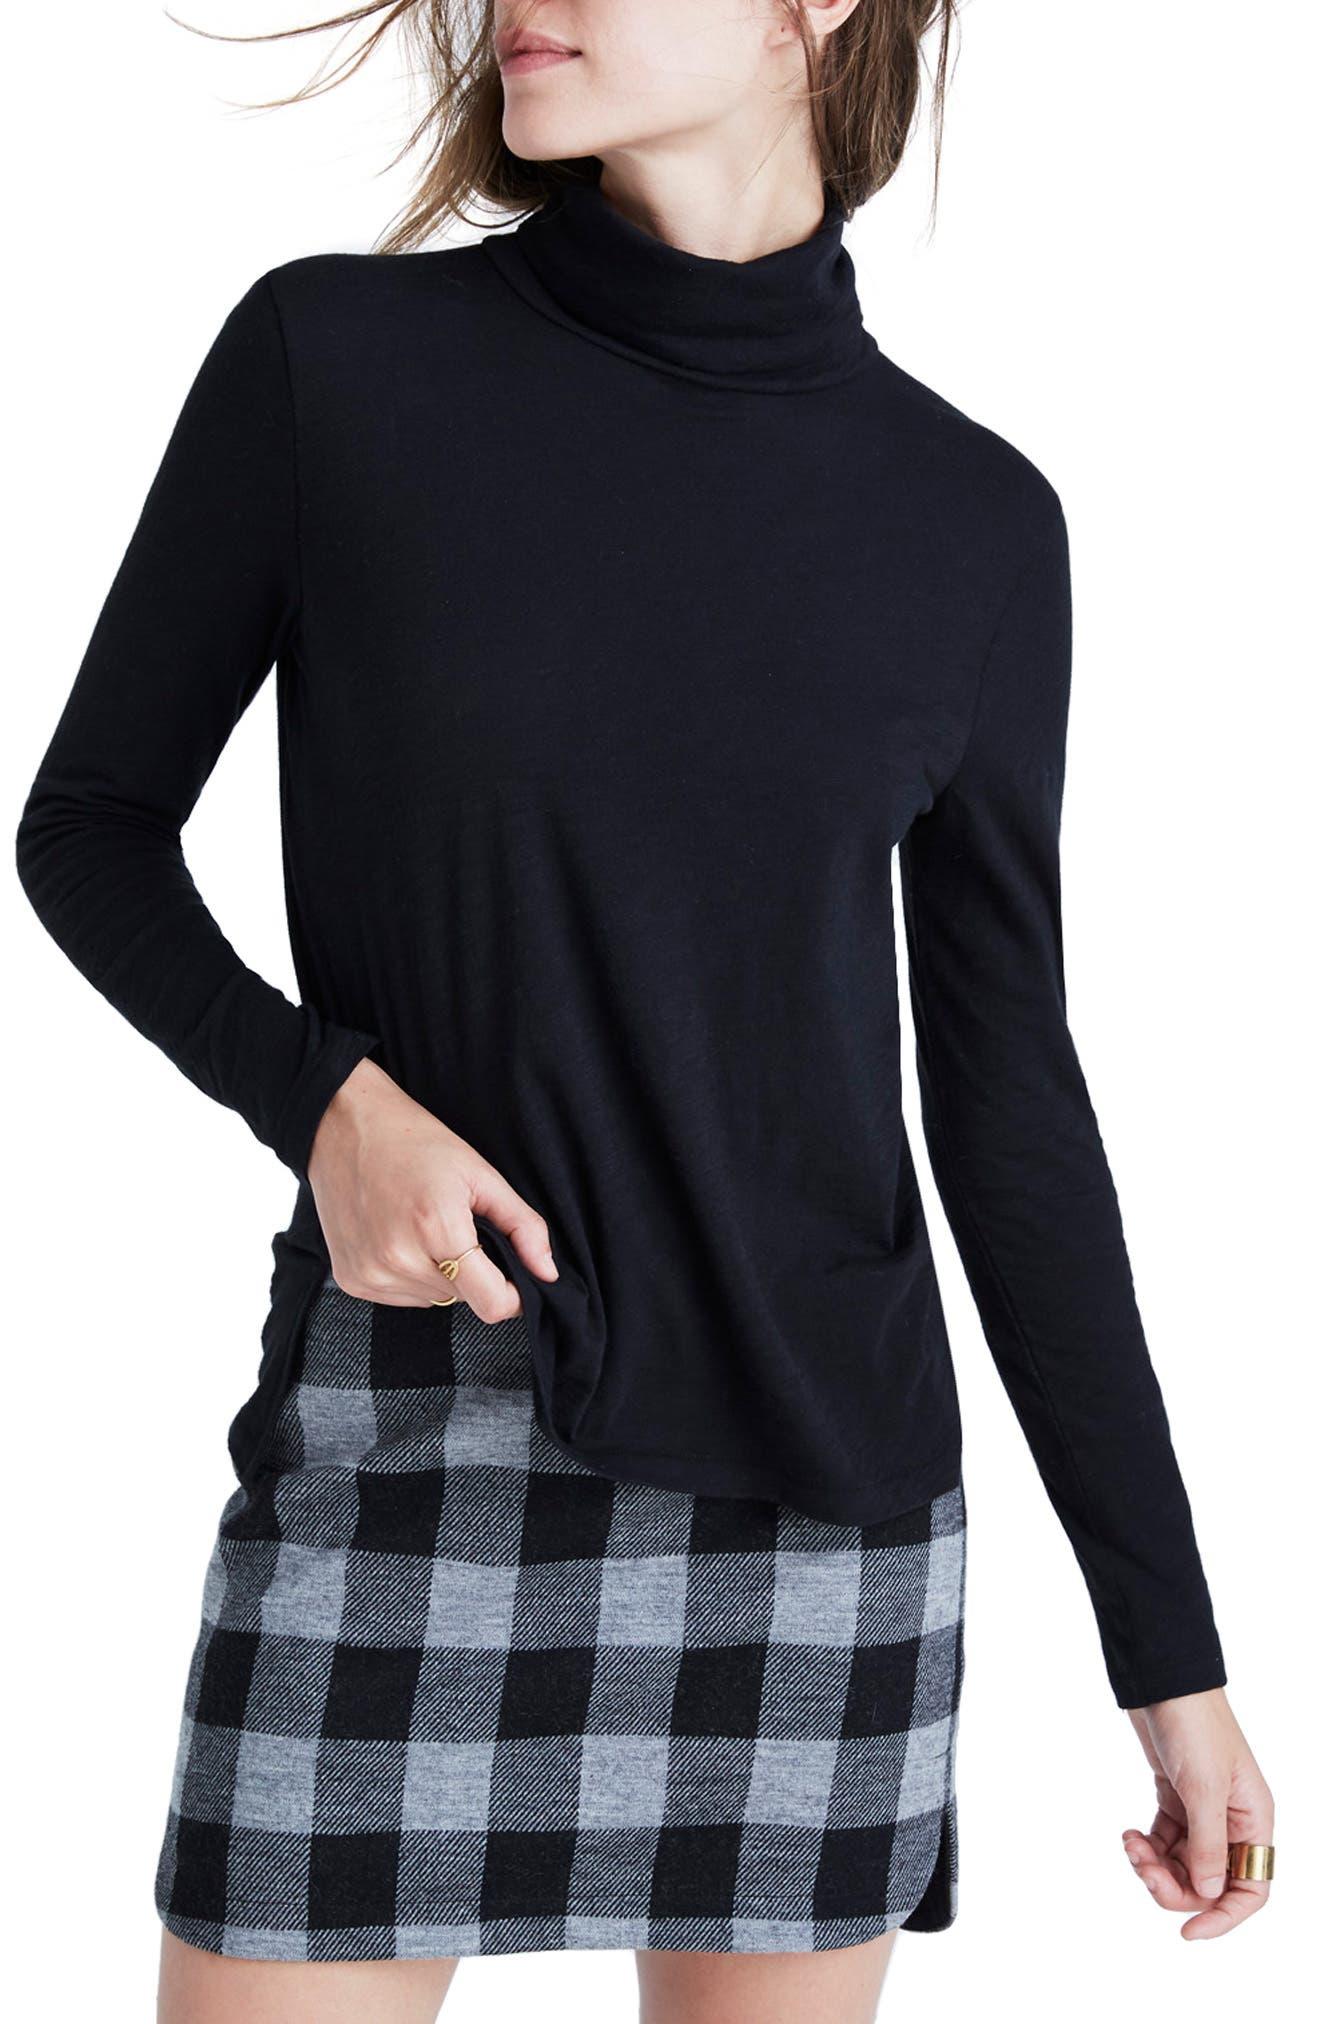 Whisper Cotton Turtleneck Top,                         Main,                         color, TRUE BLACK